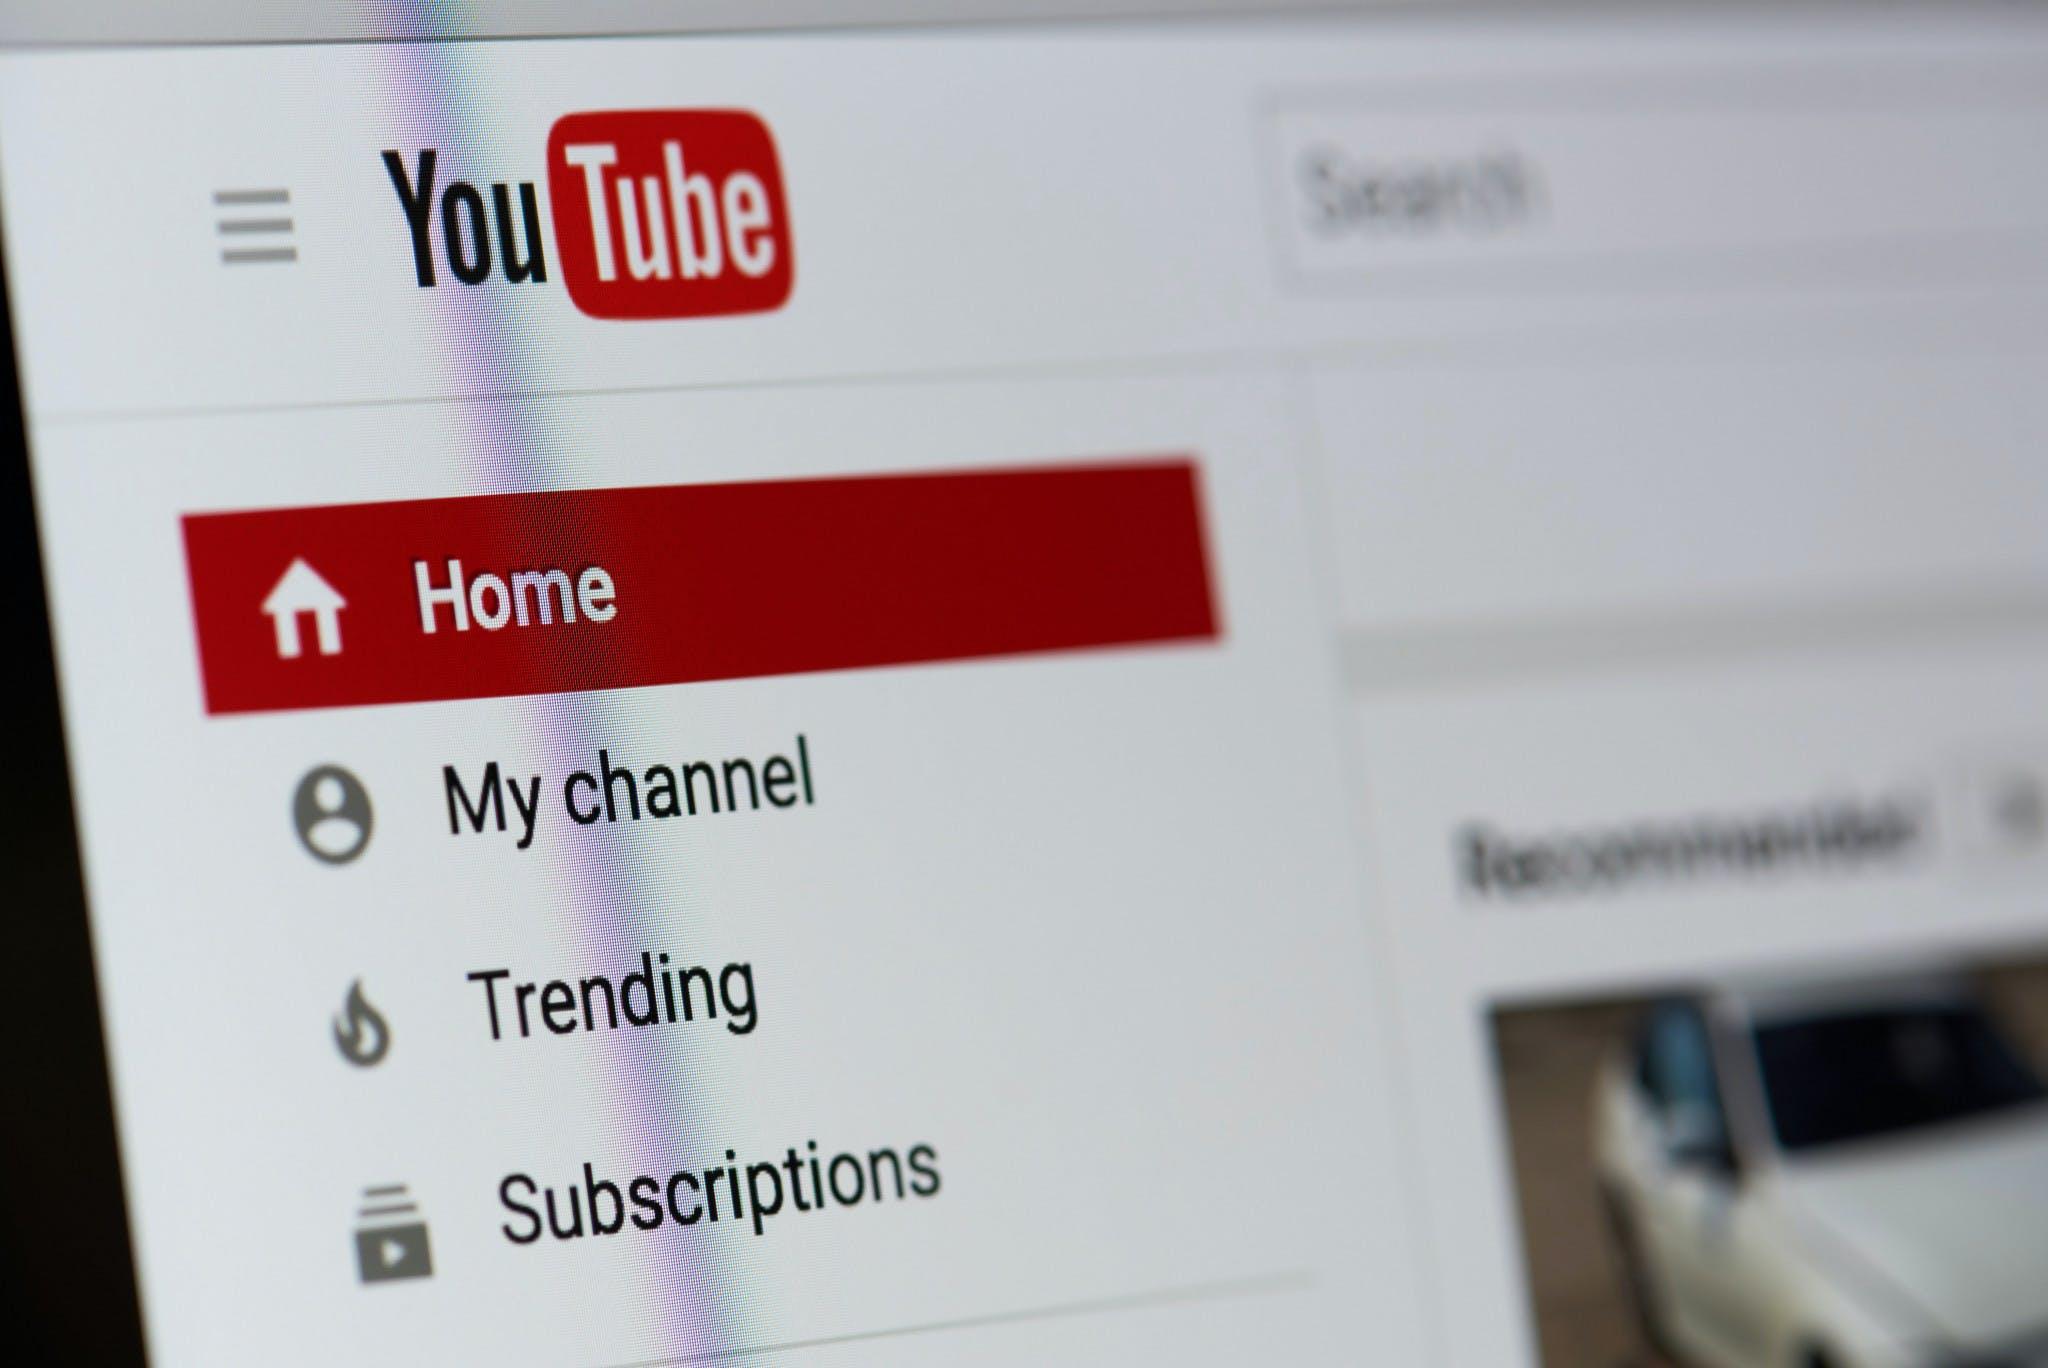 YouTube home screen